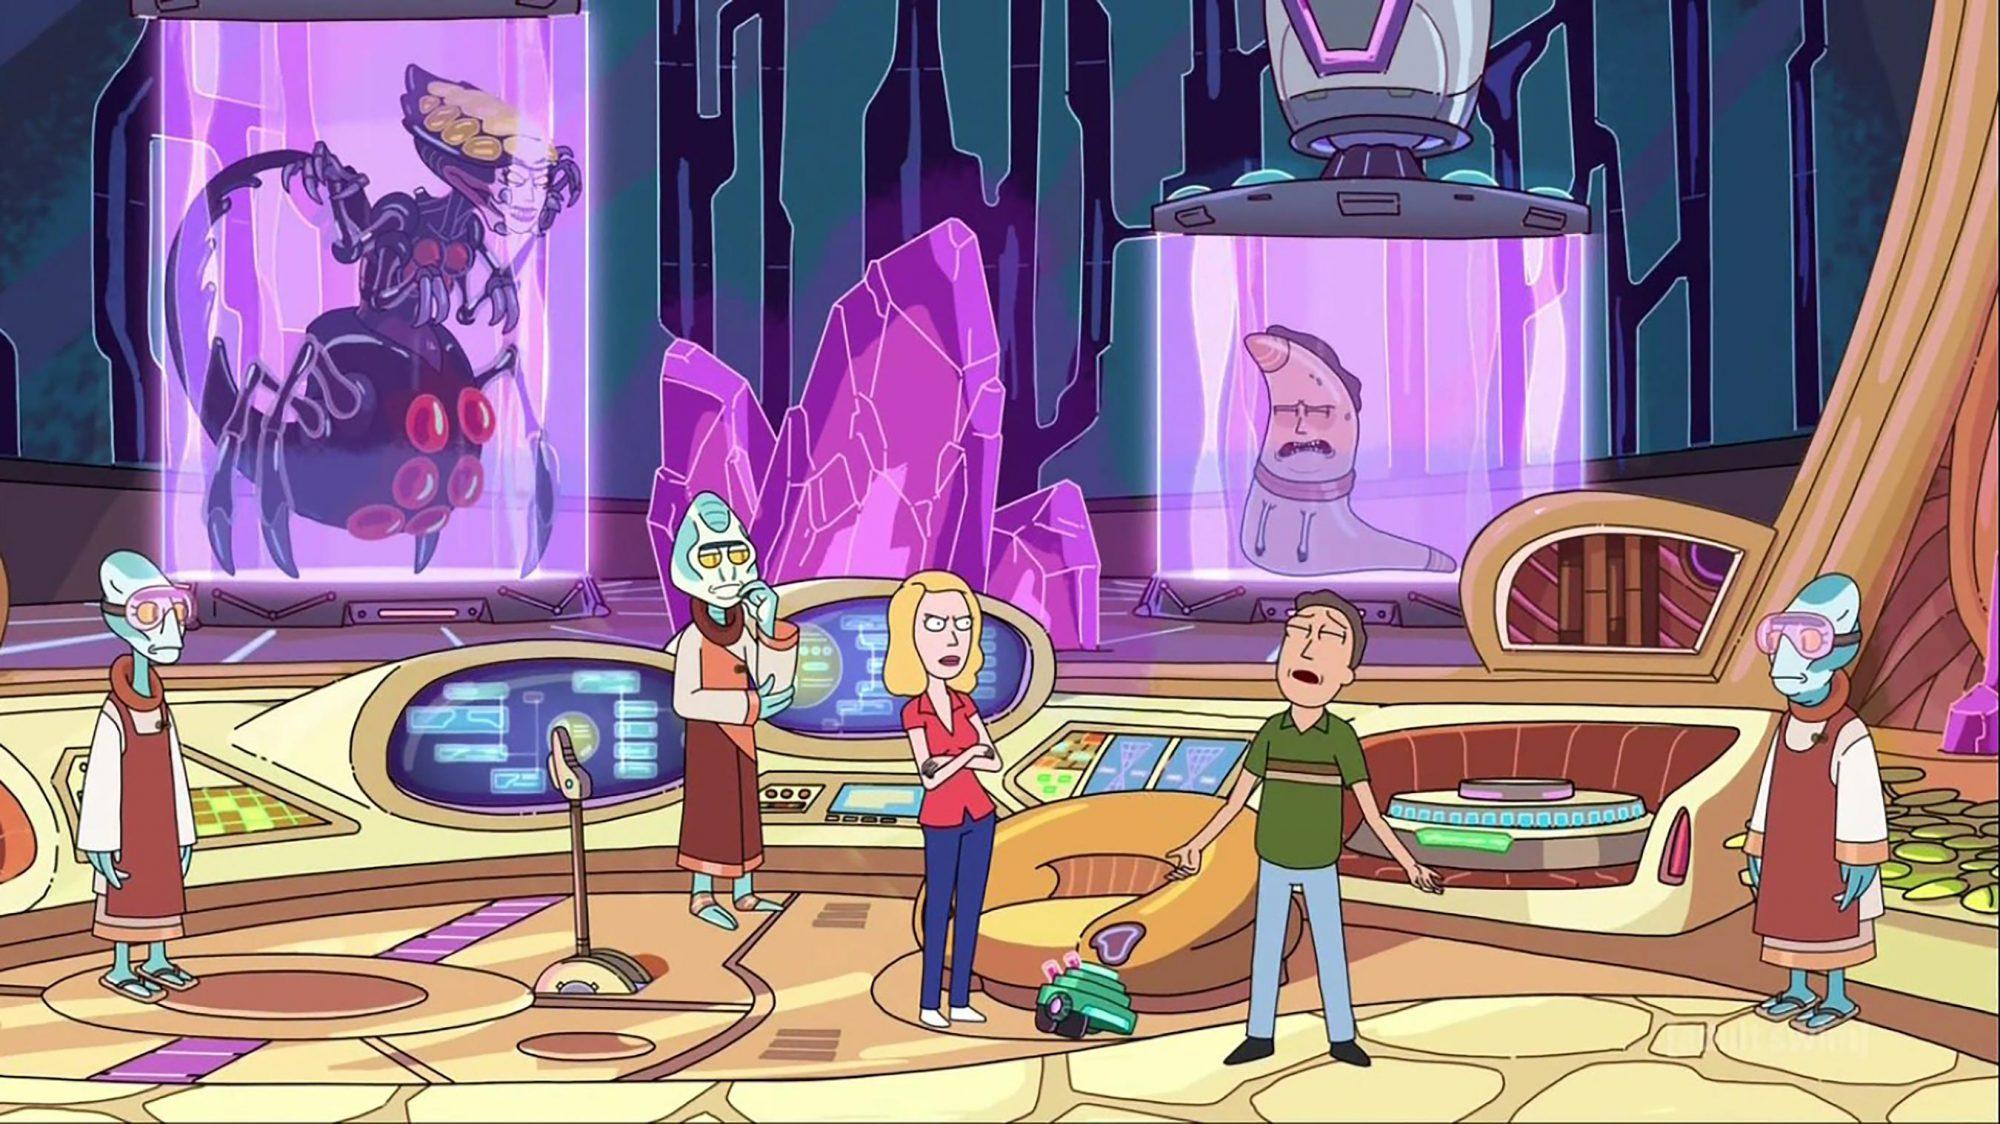 Ricky and Morty - Nuptia 4 (Season 2, Episode 7)